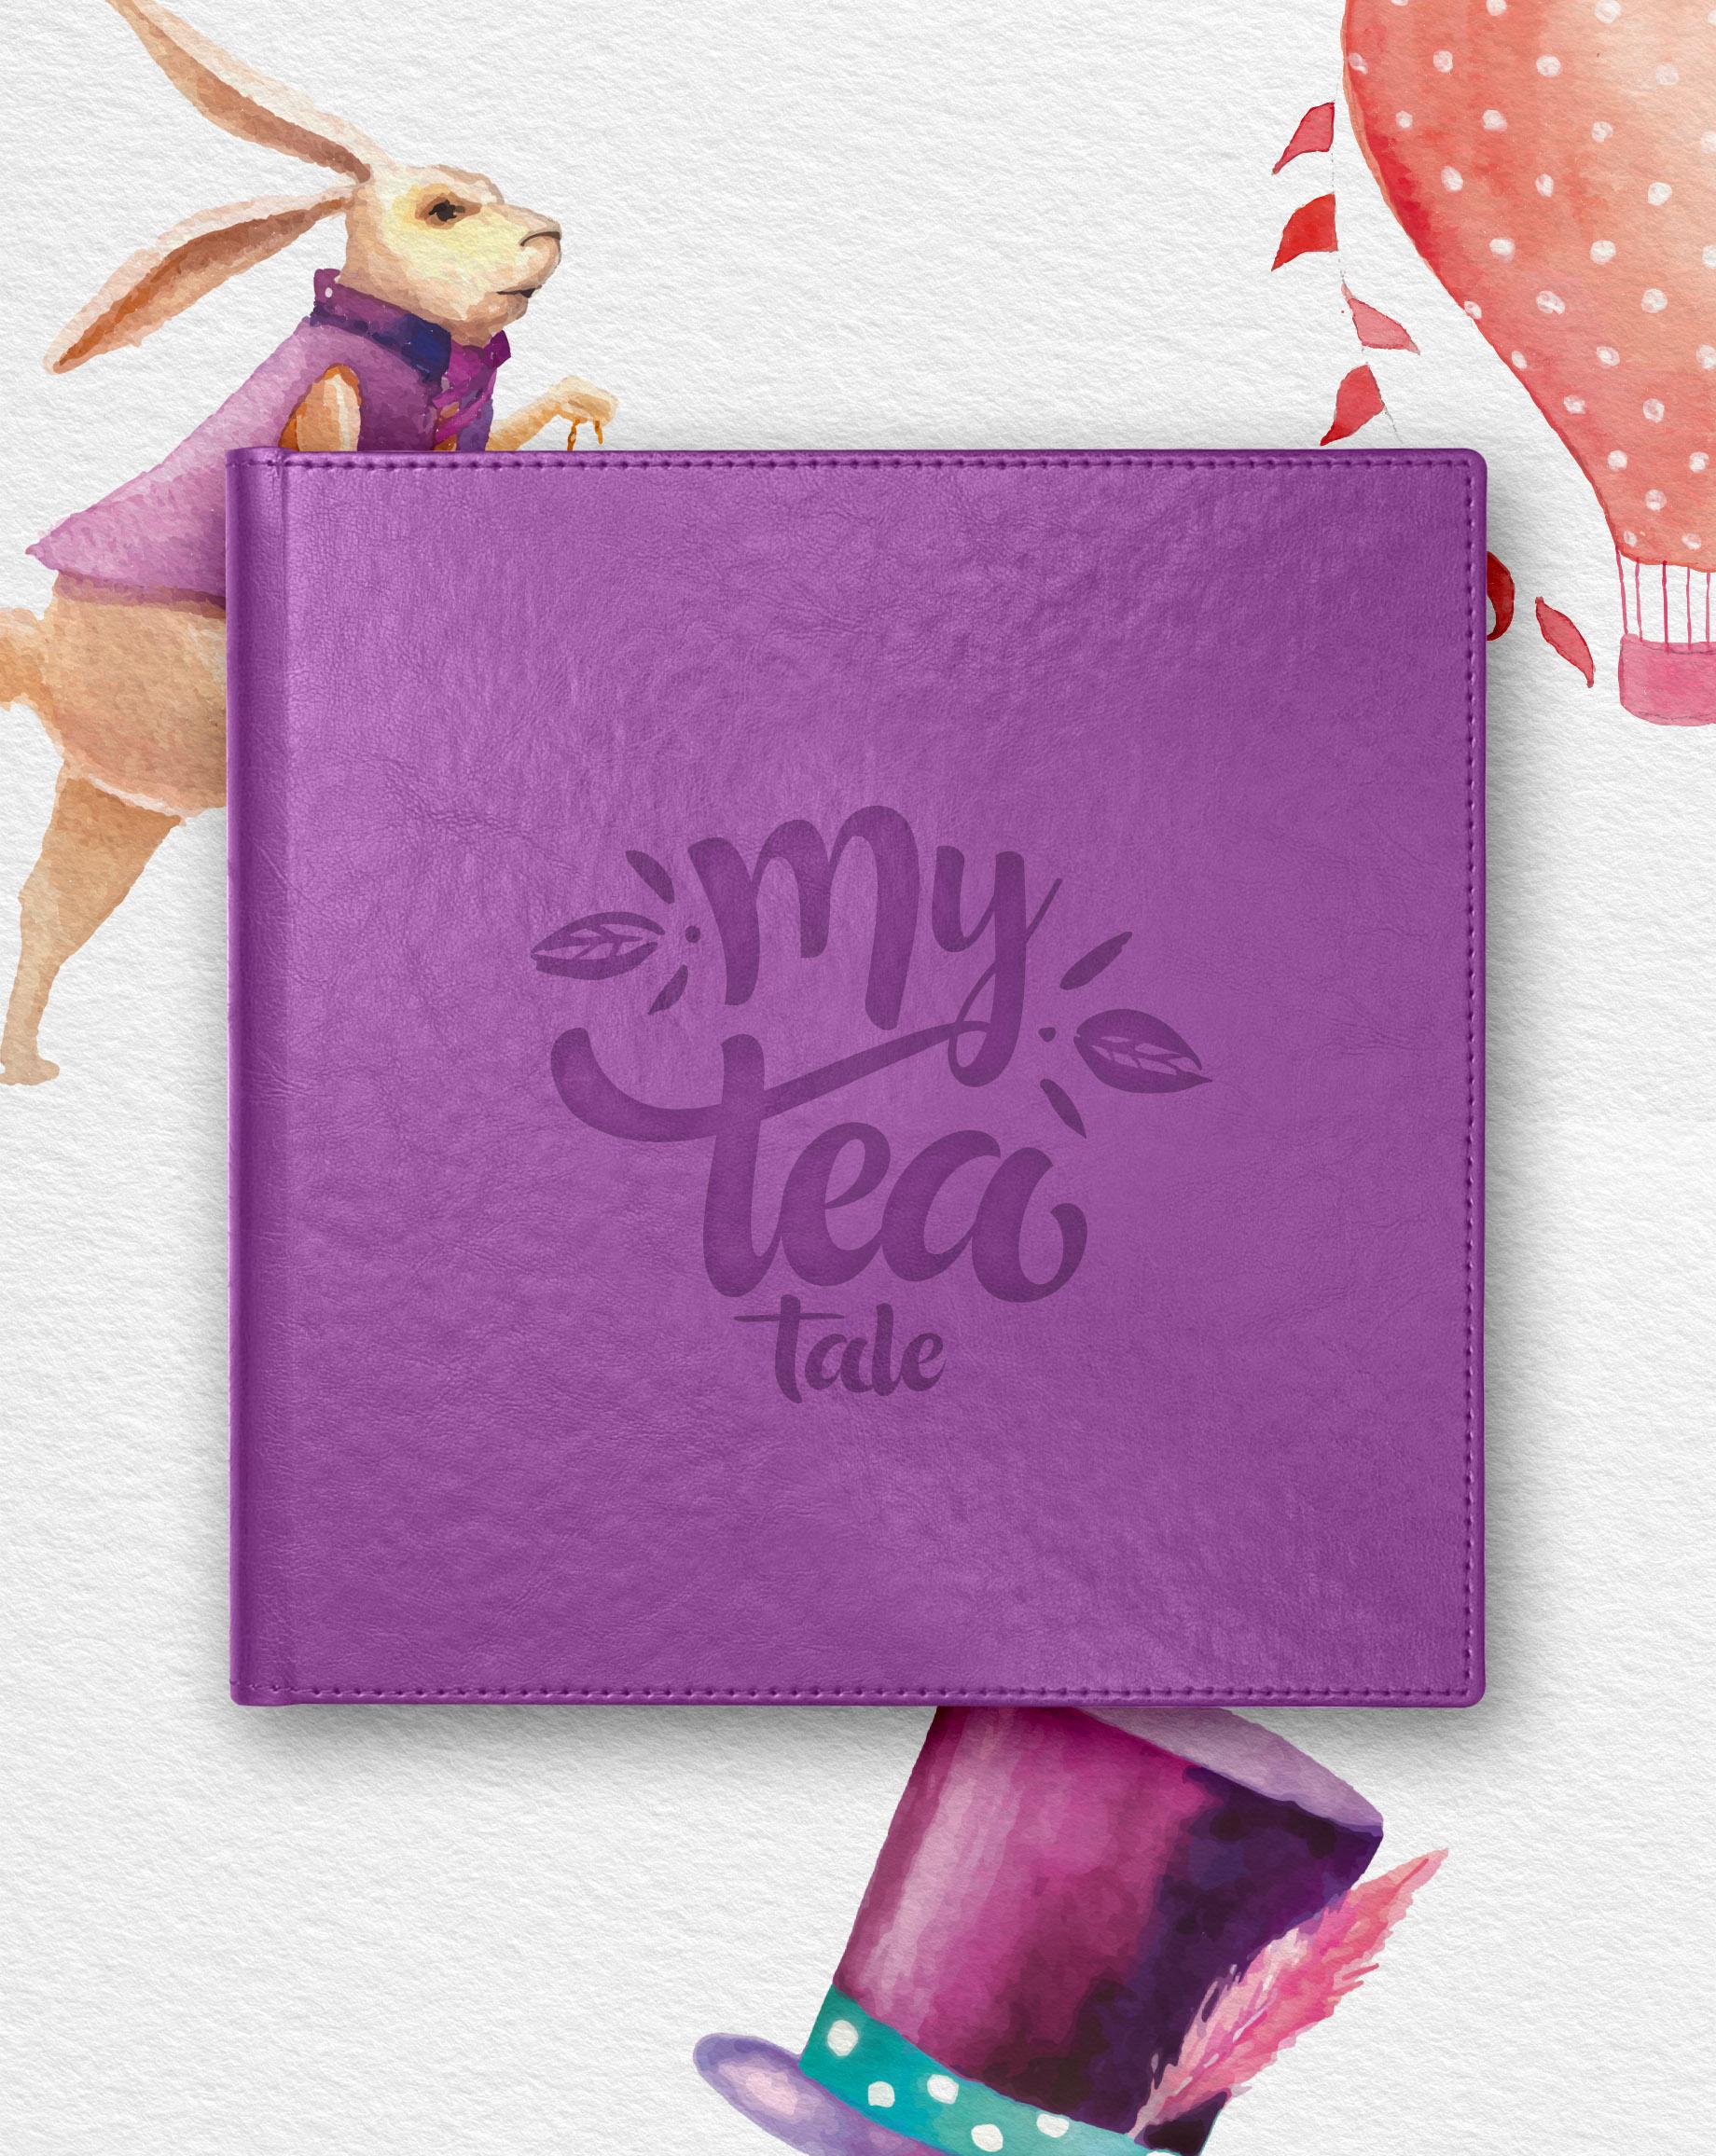 MY TEA TALE